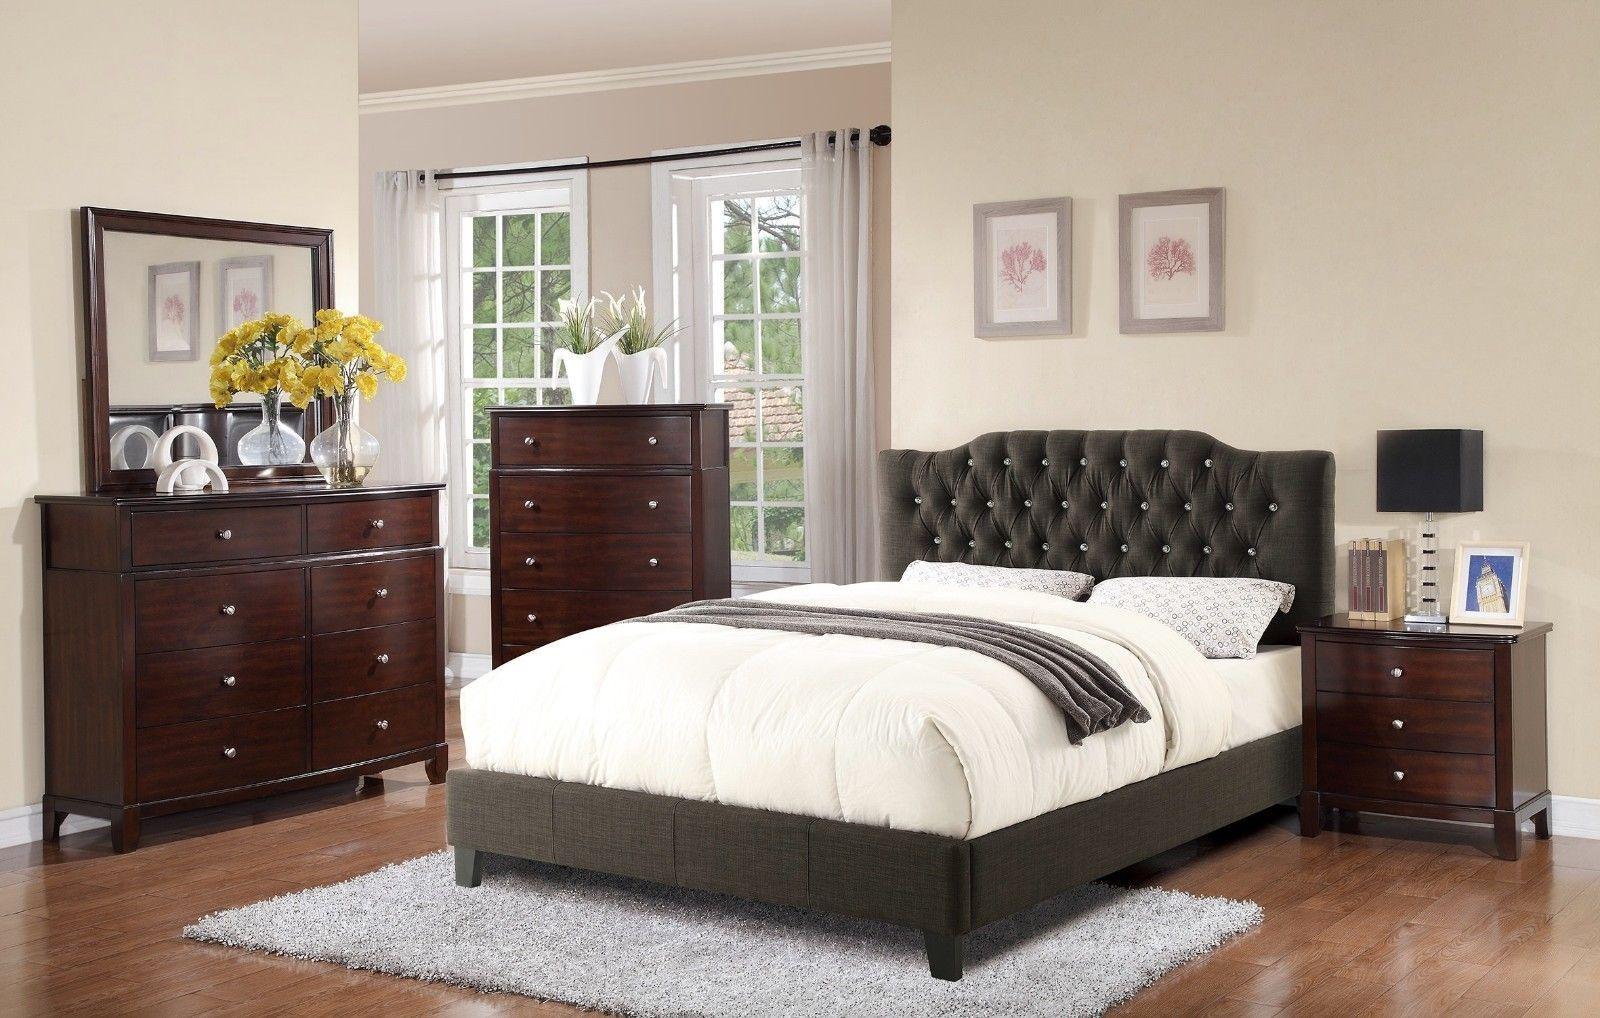 4p bedroom furniture full size bed dresser mirror